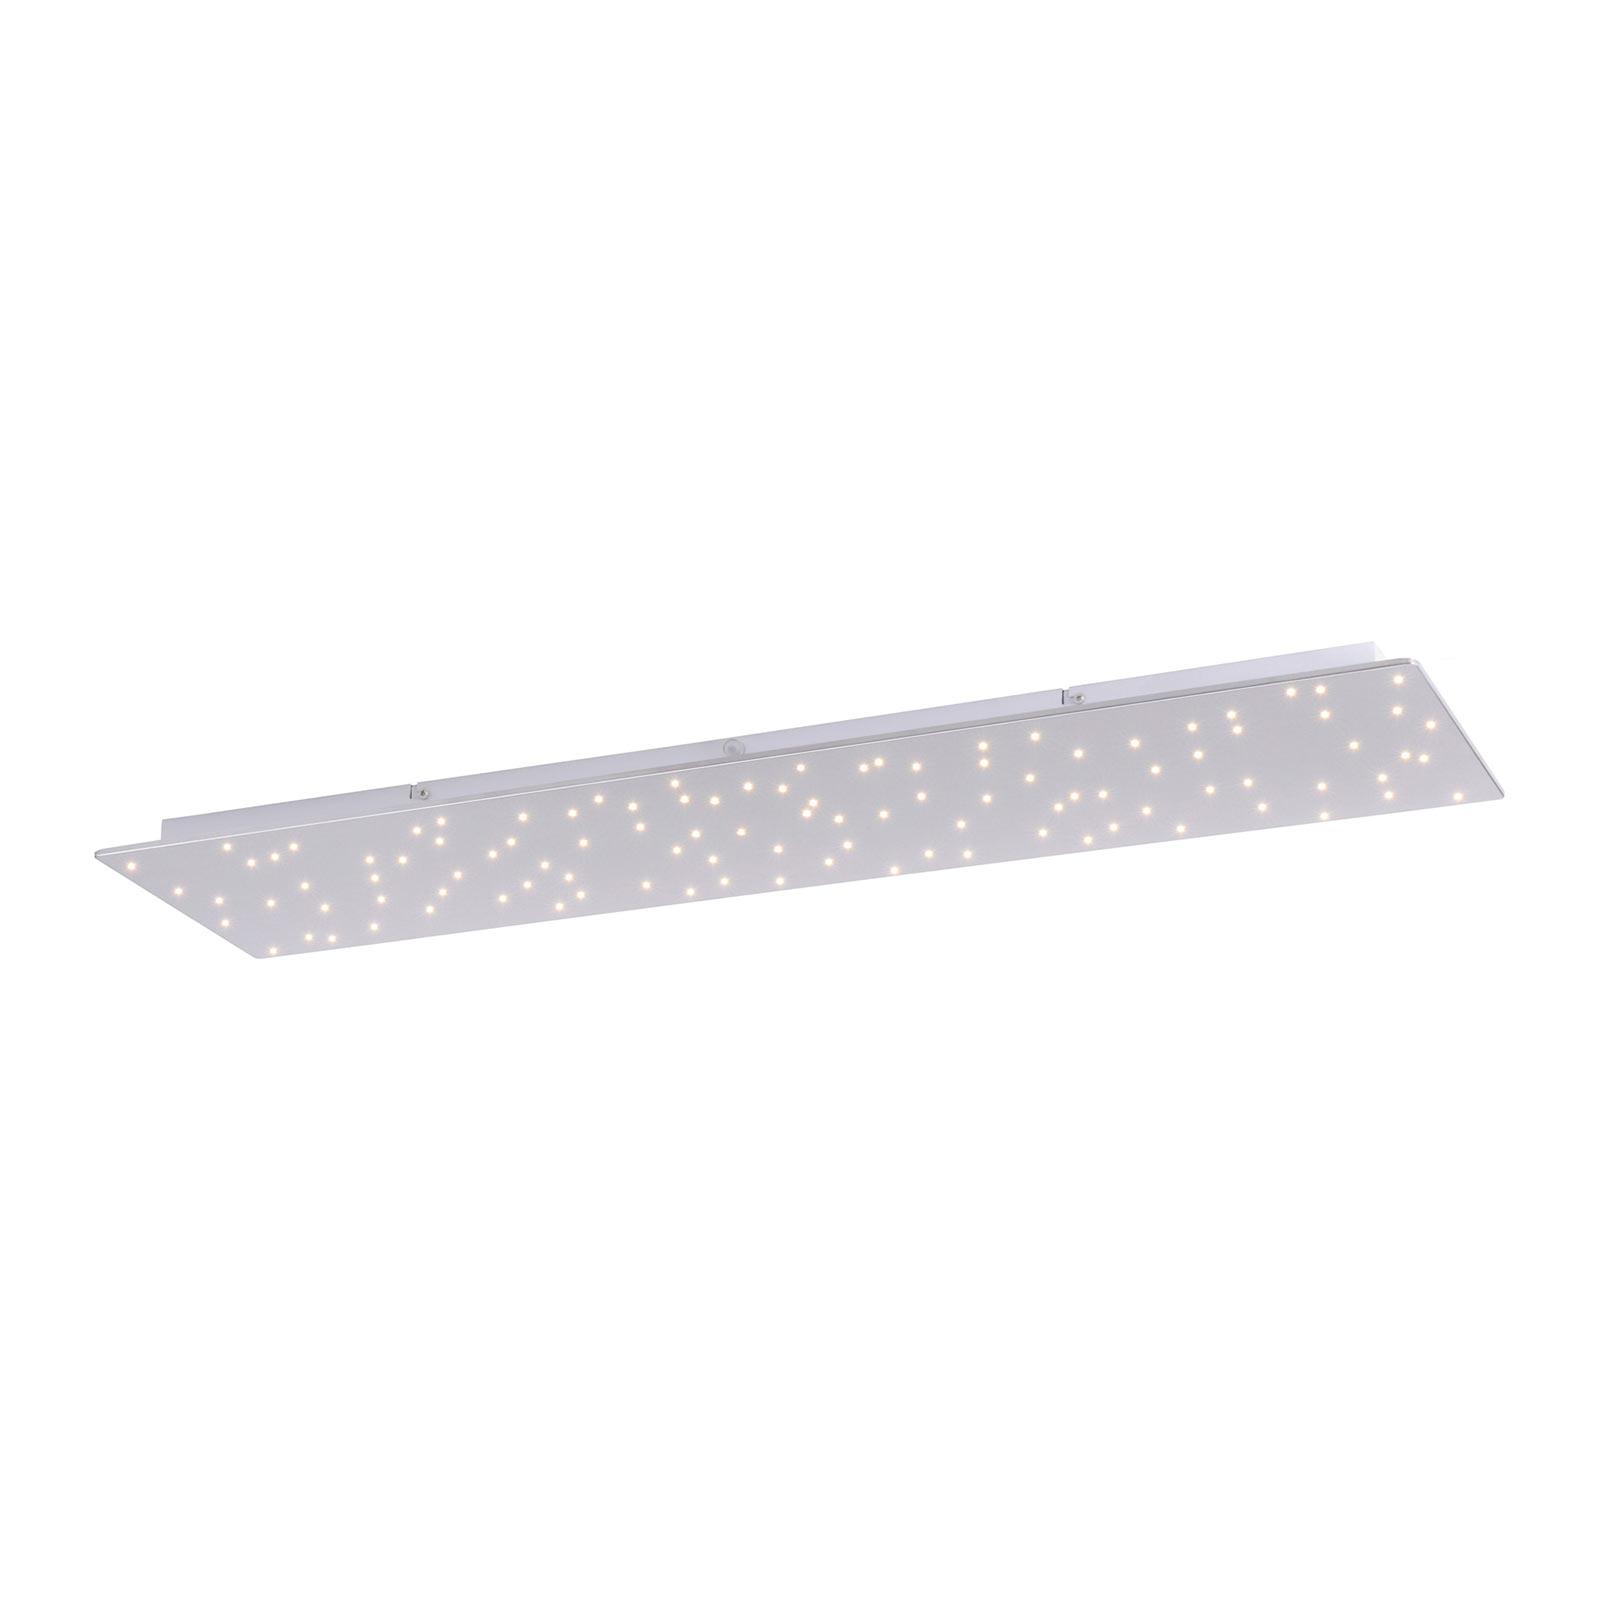 LED-Deckenleuchte Sparkle, tunable white, 100x25cm